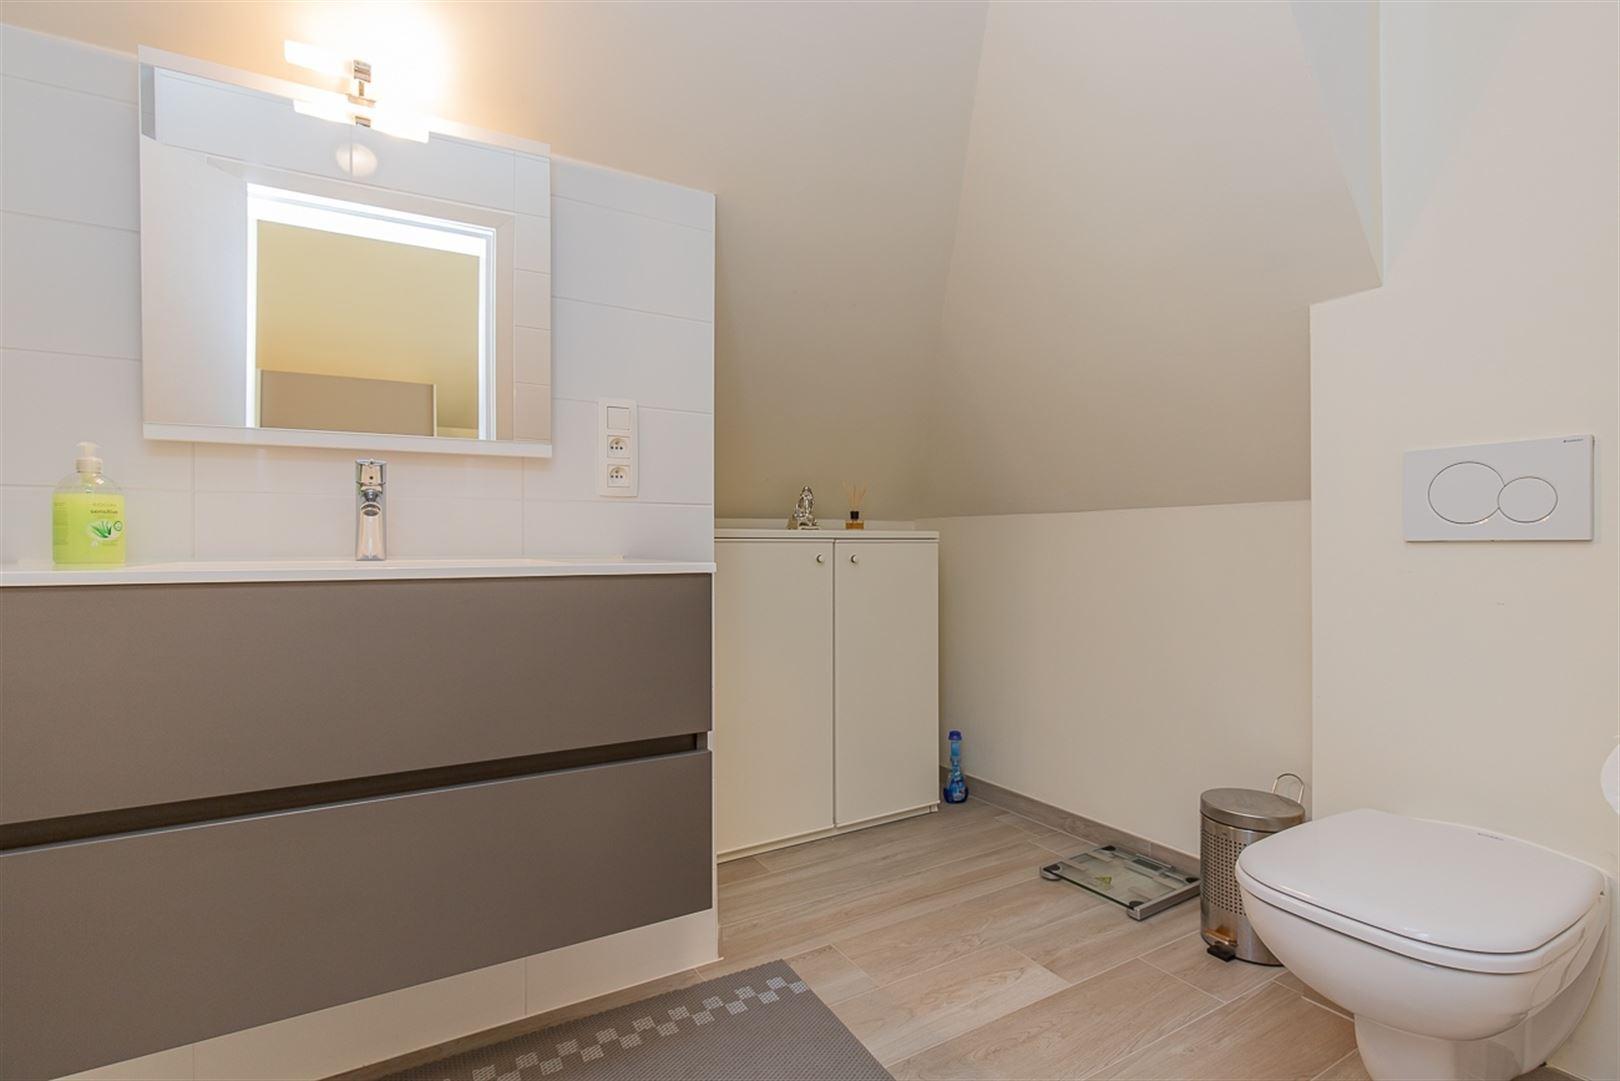 Foto 14 : Duplex/Penthouse te 9200 DENDERMONDE (België) - Prijs € 399.000